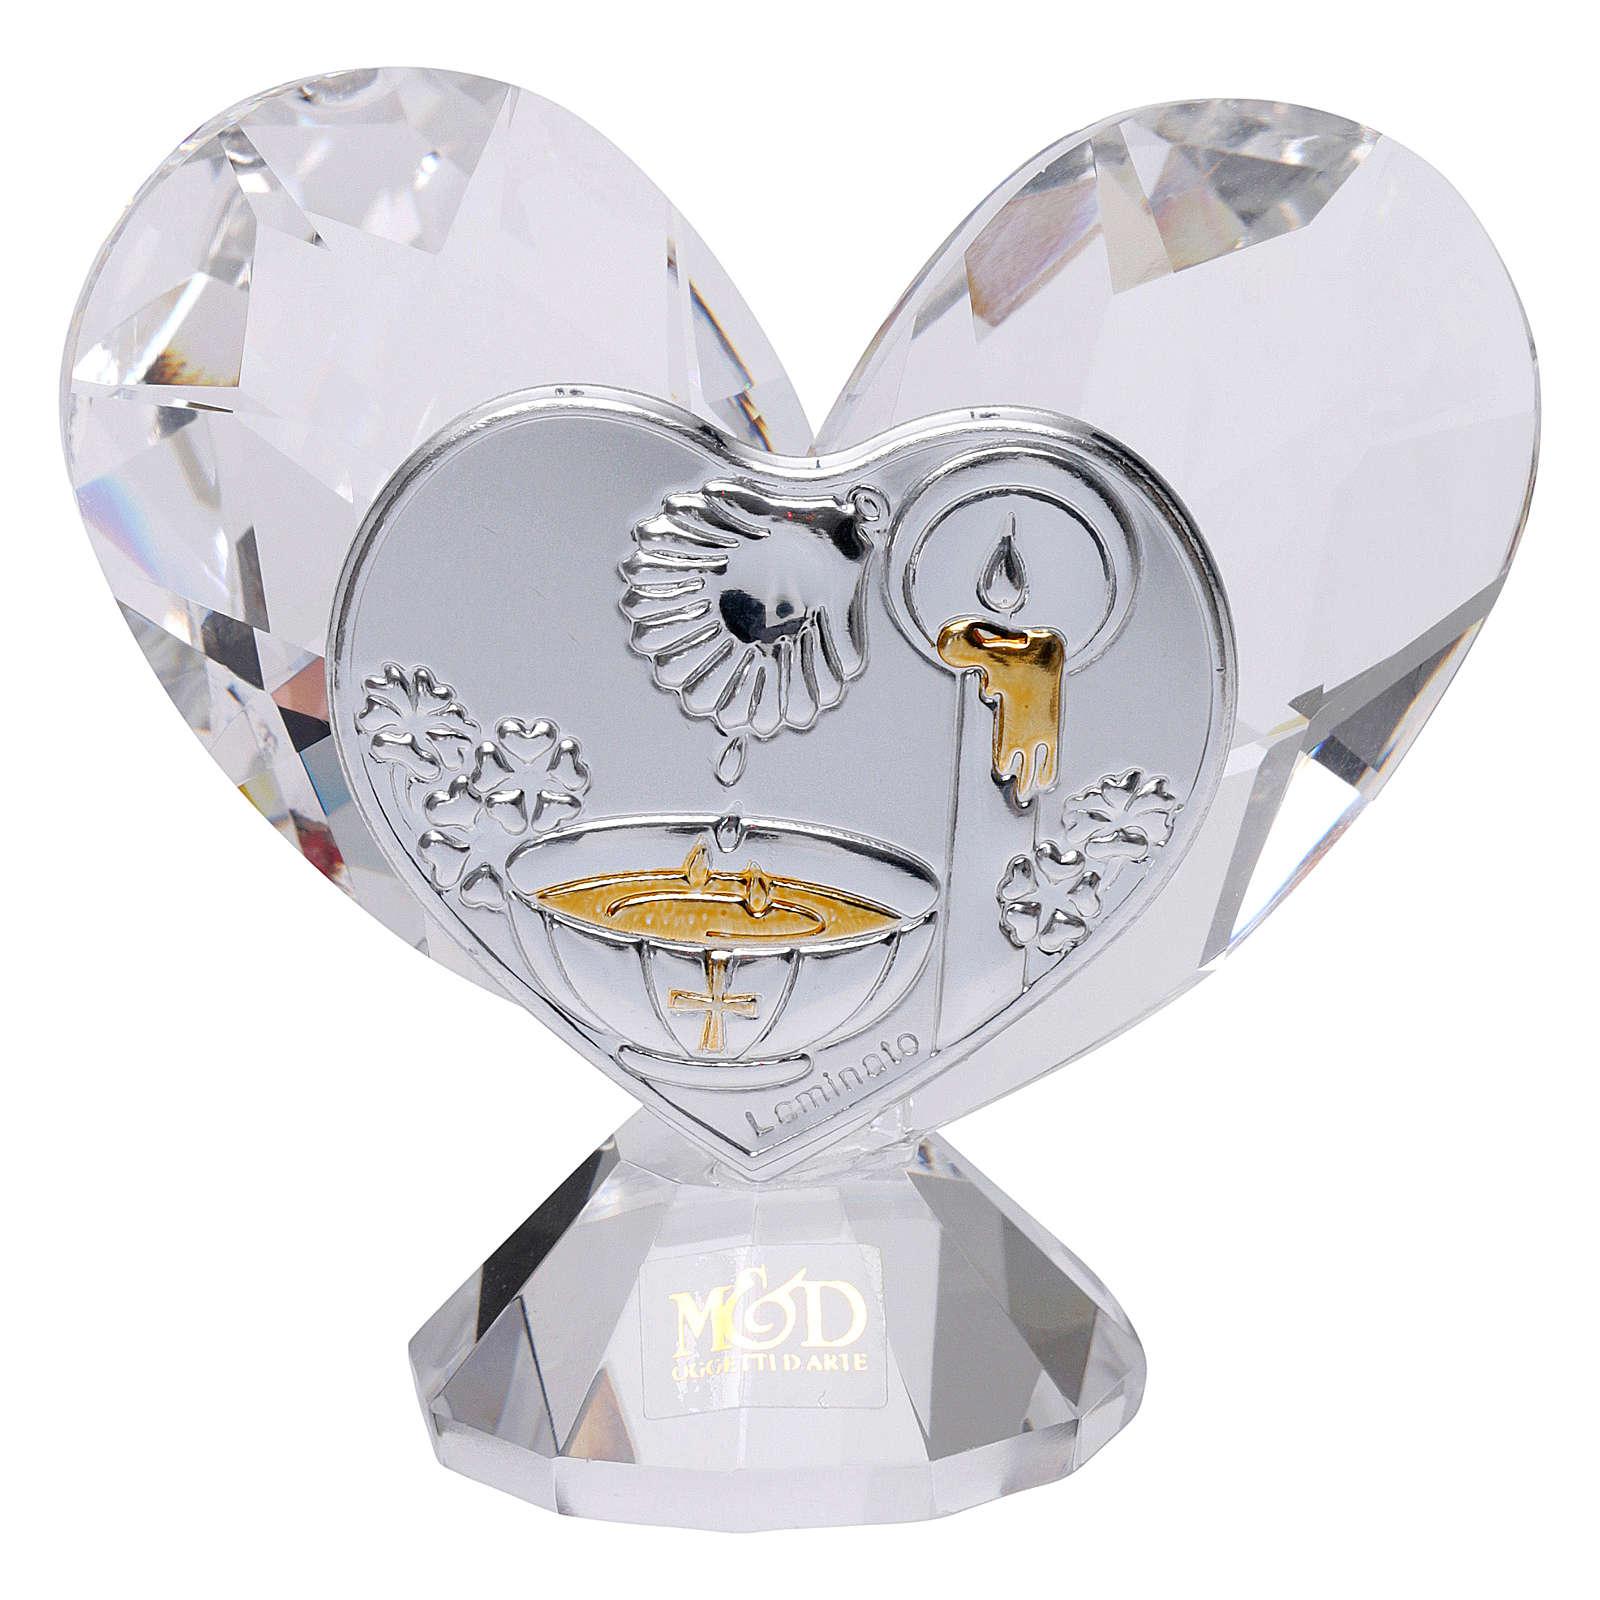 Bombonera Bautismo corazón 5x5 cm 3